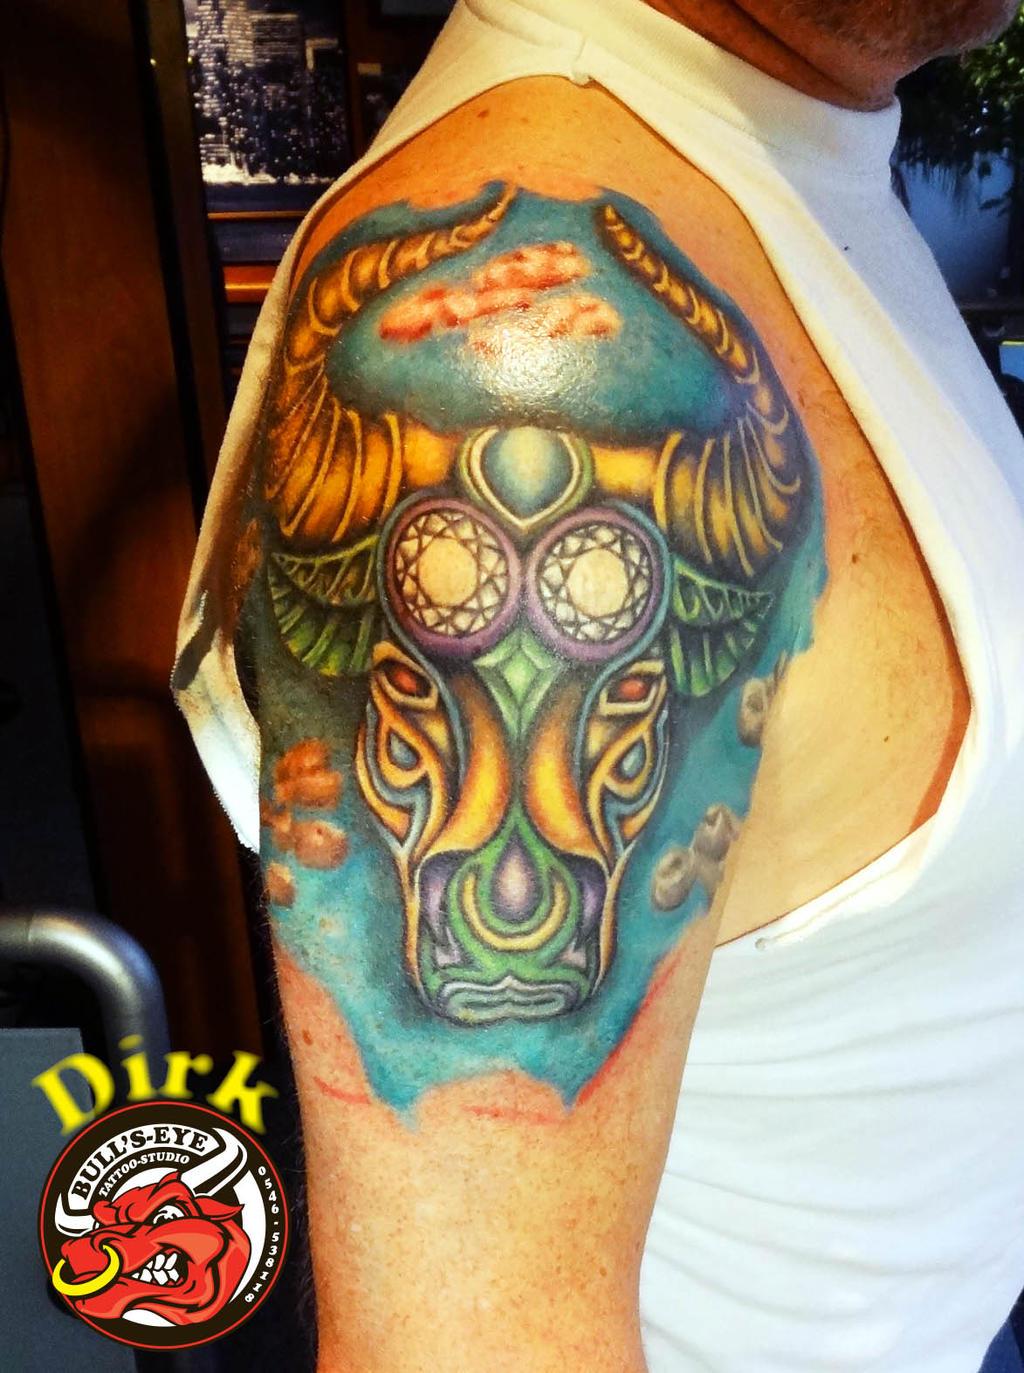 Bull head full colour tattoo by bullseyetattoo on deviantart for Full head tattoo